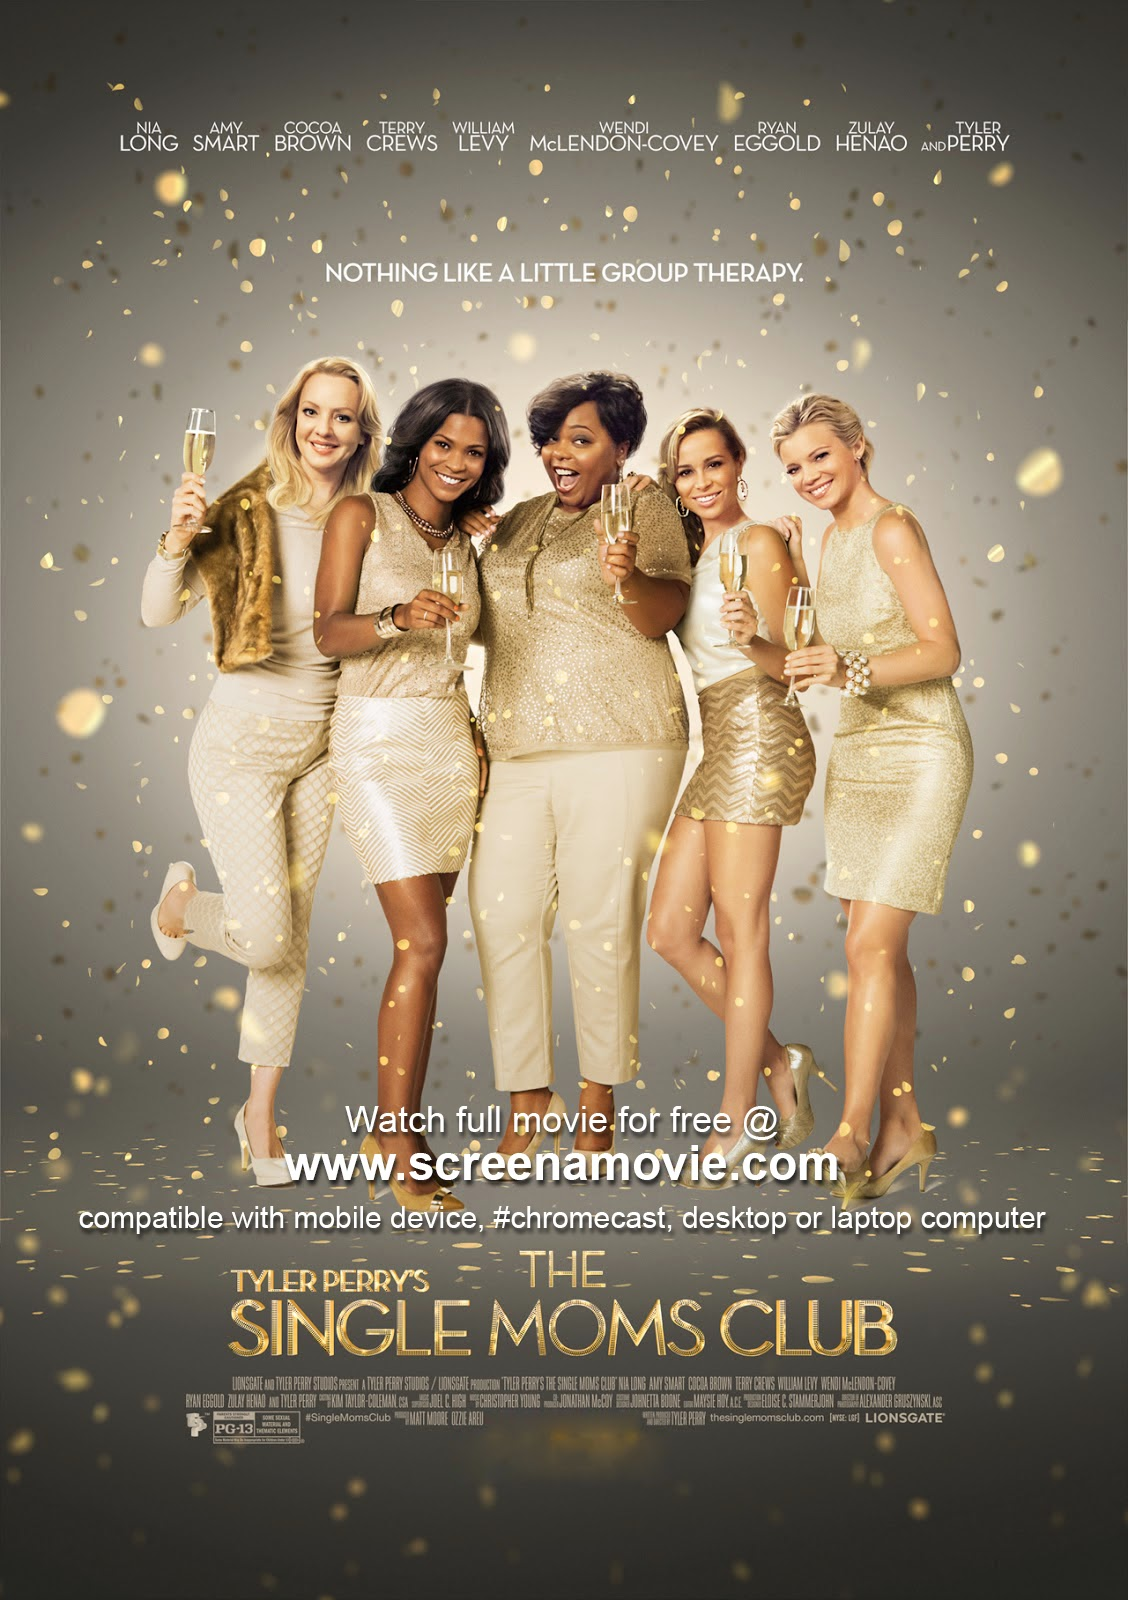 The Single Moms Club_@screenamovie